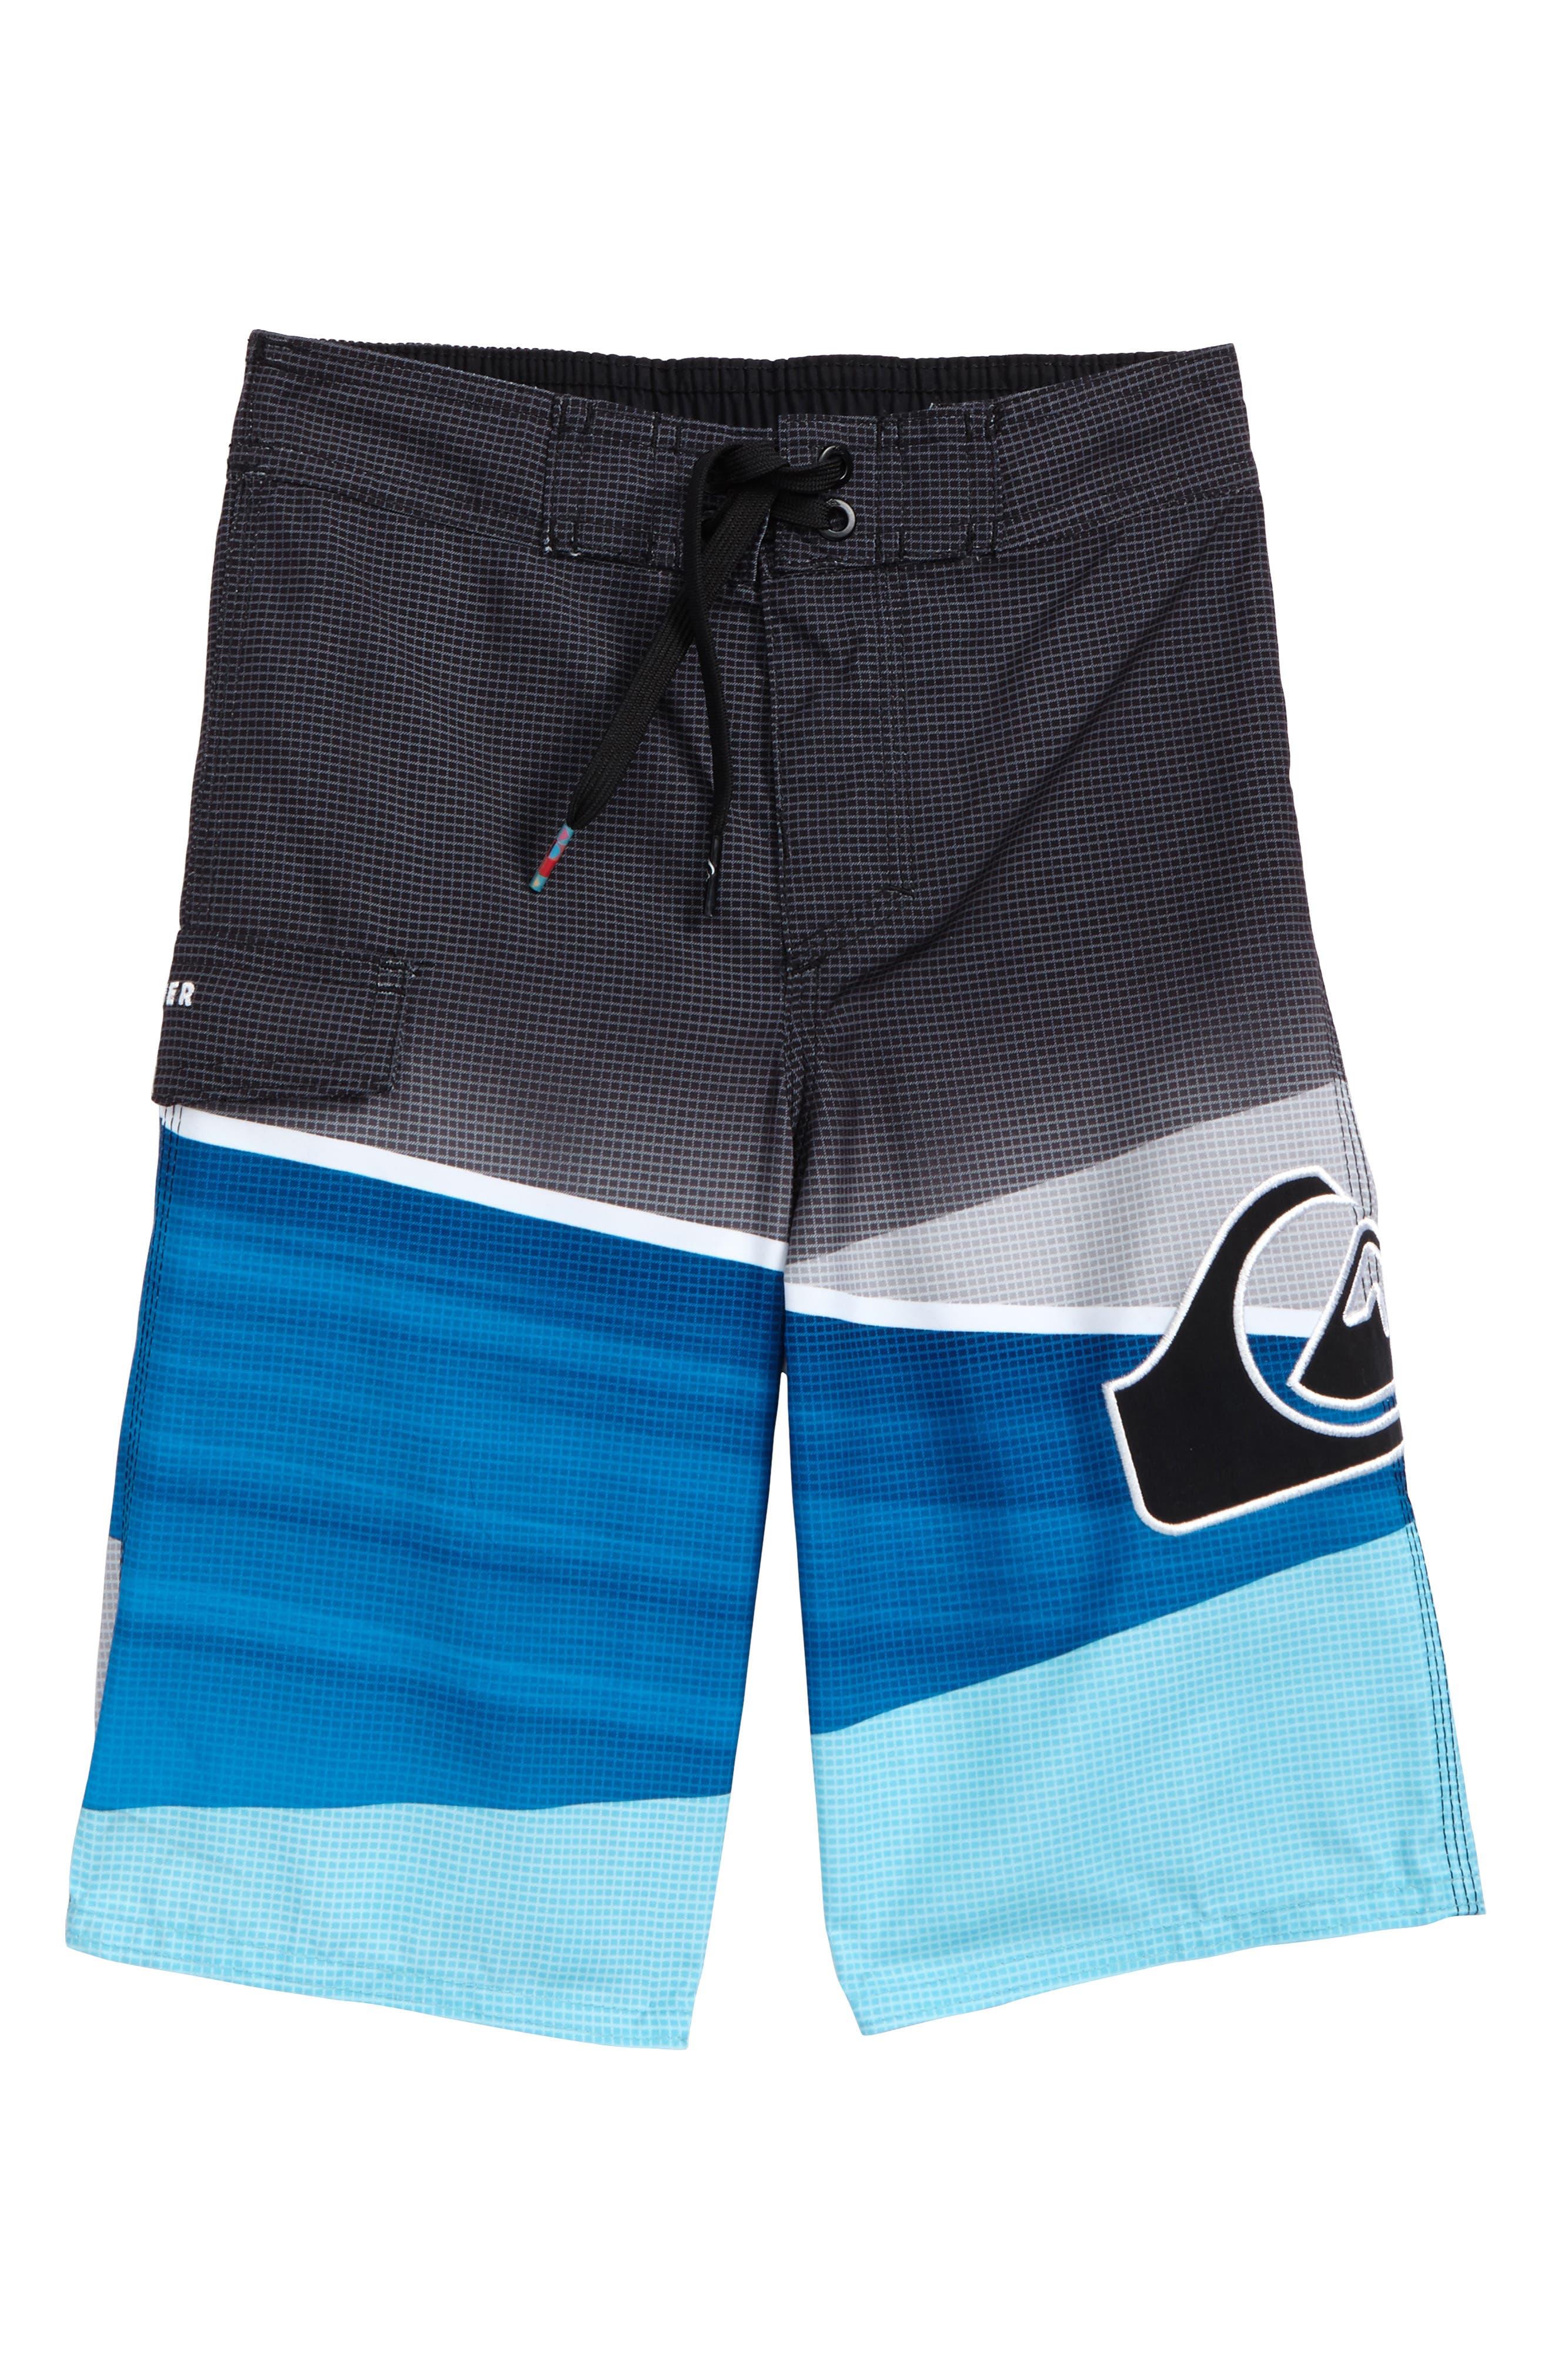 Slash Board Shorts,                         Main,                         color, 422